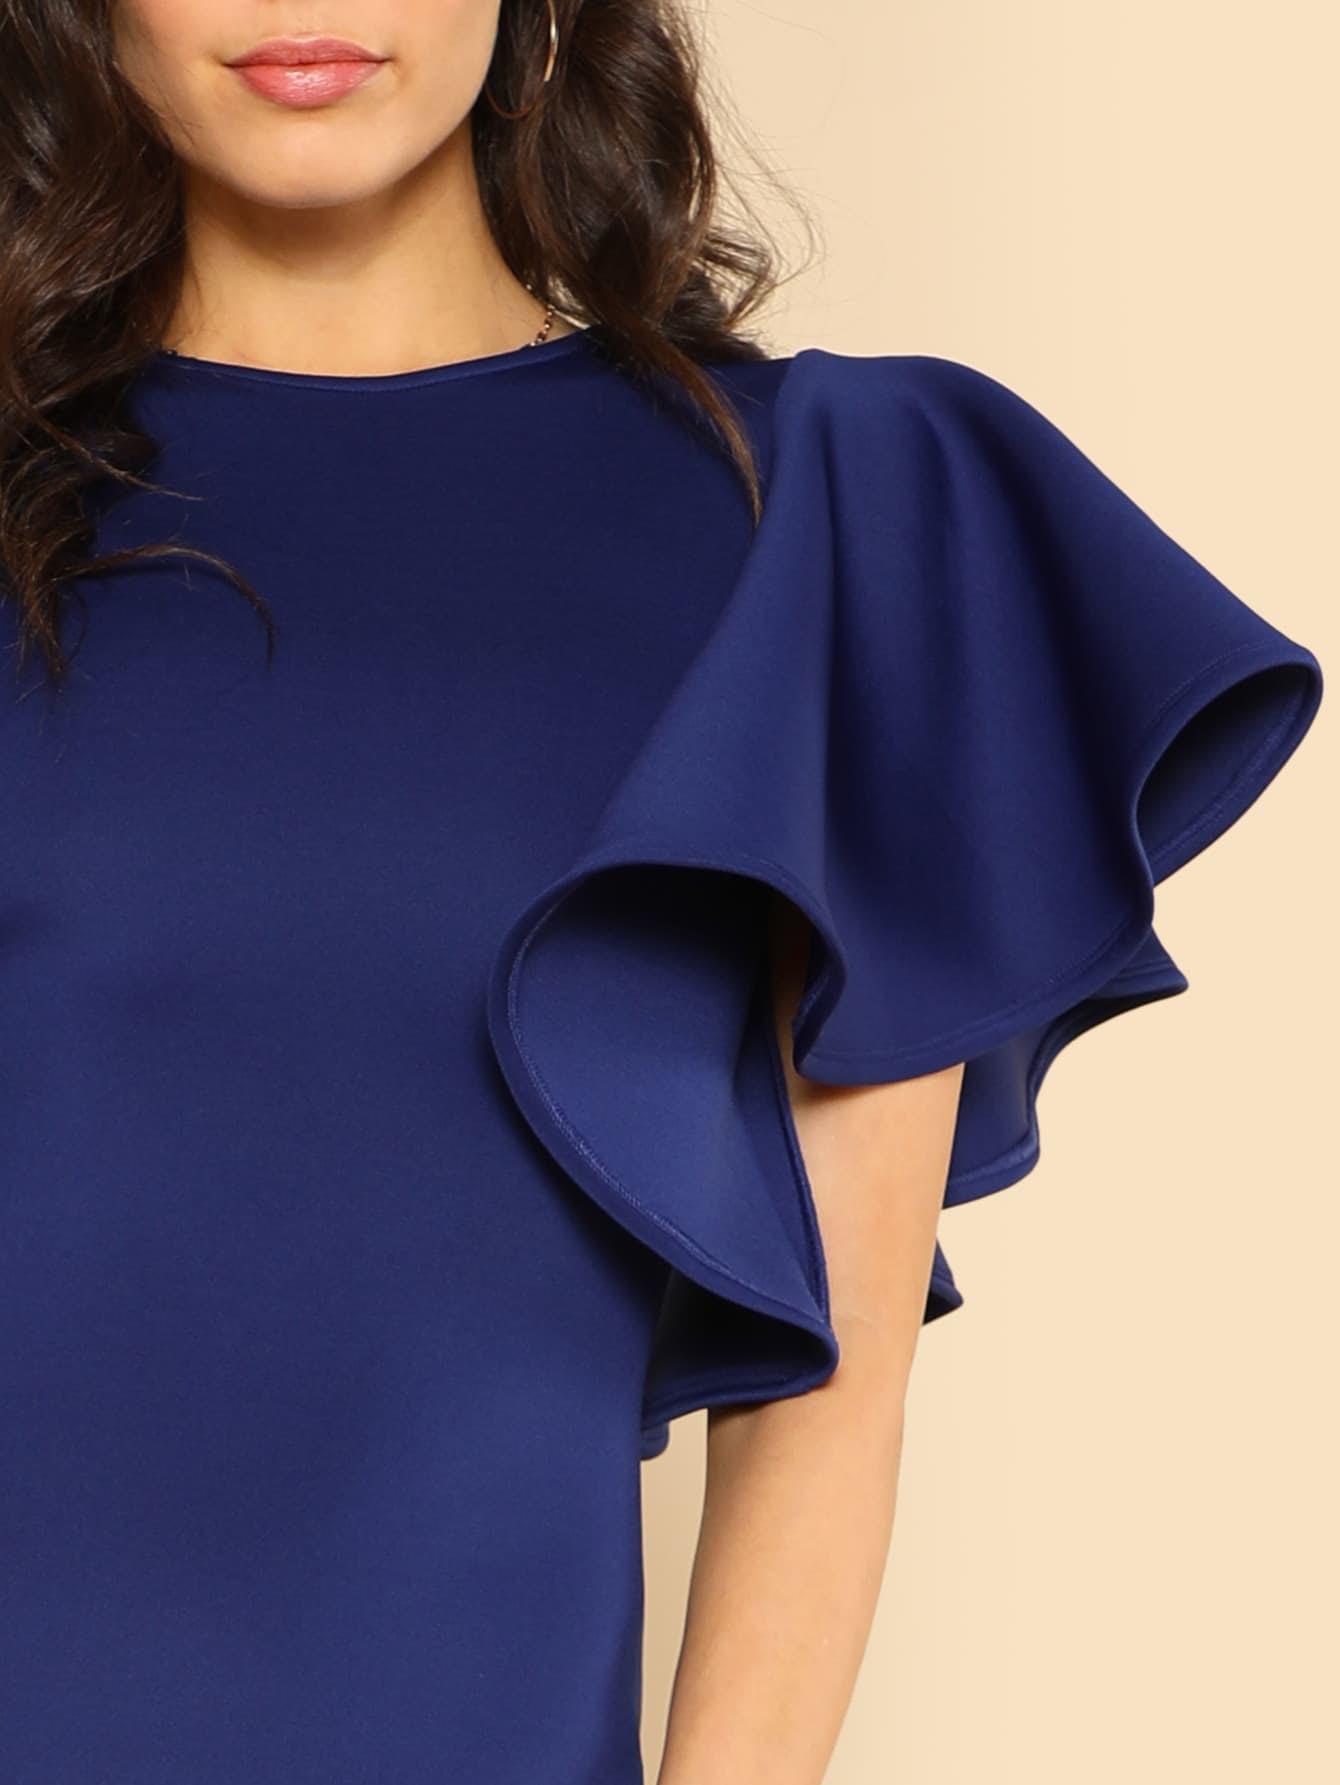 Ebay for dubai neon rib square neck belted bodycon dress online marks